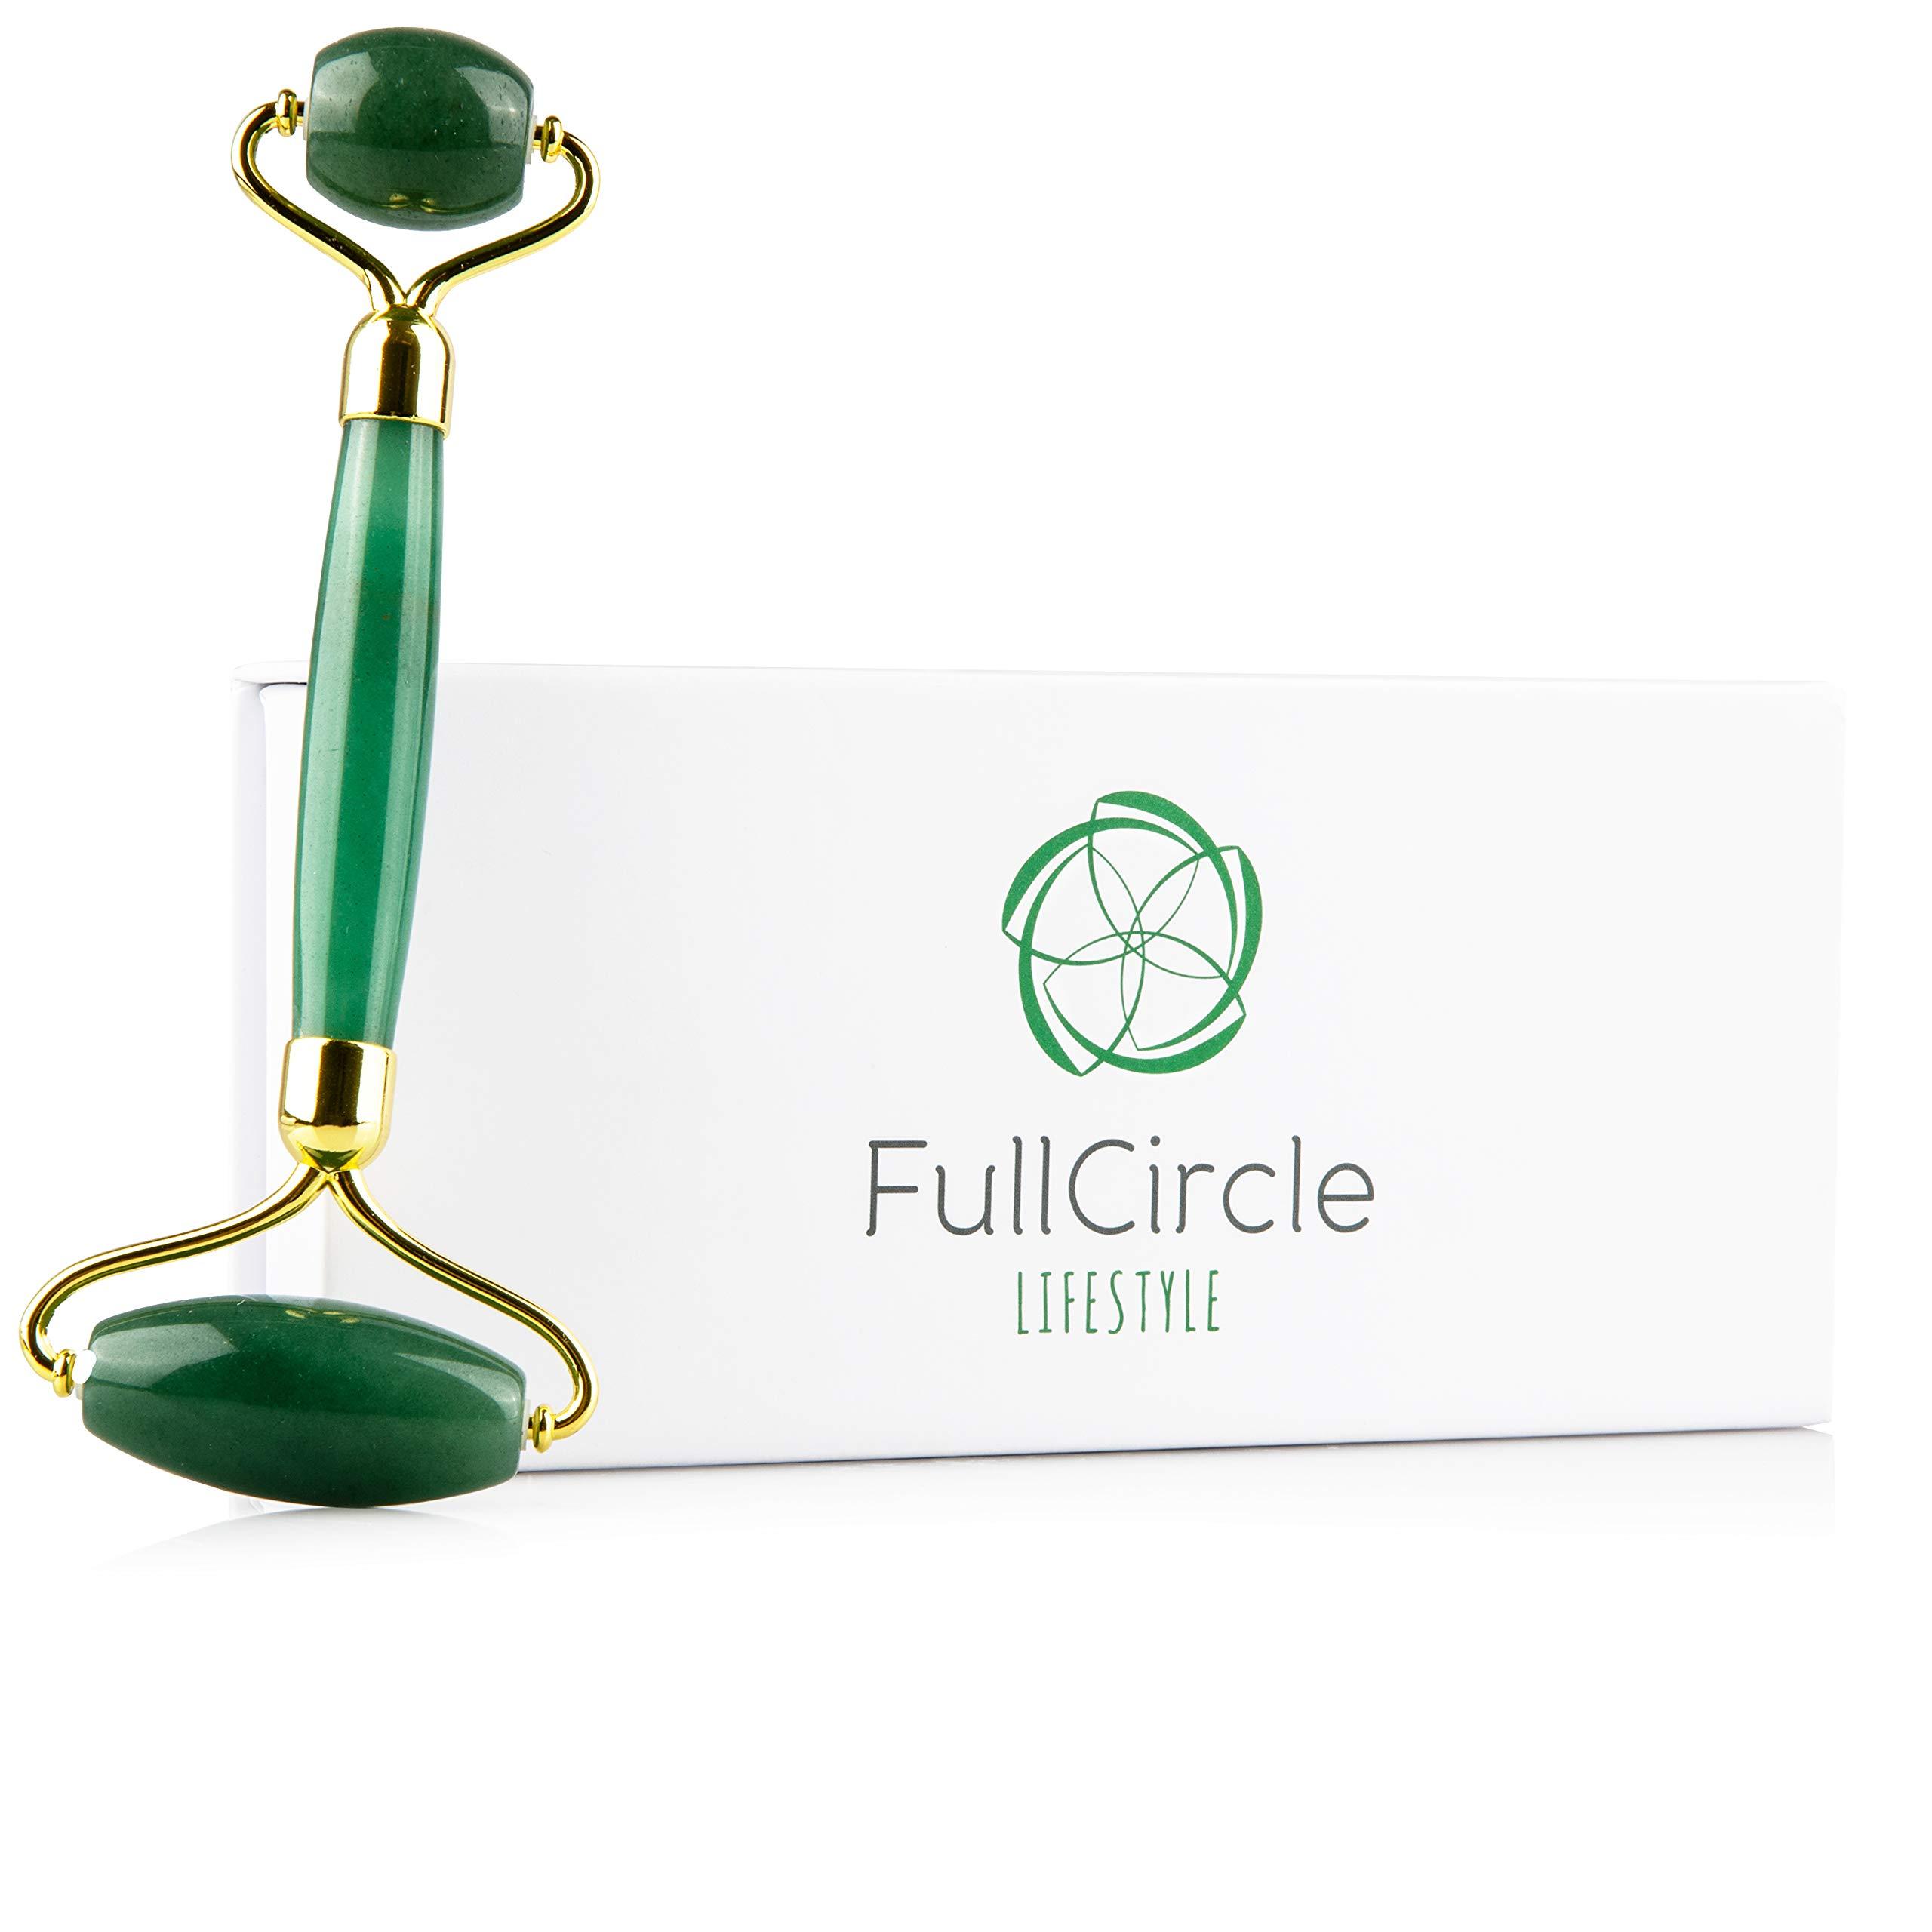 Jade Roller For Face By FullCircle Lifestyle - No Squeak & Built To Last 100% Natural Jade Face Roller Massager